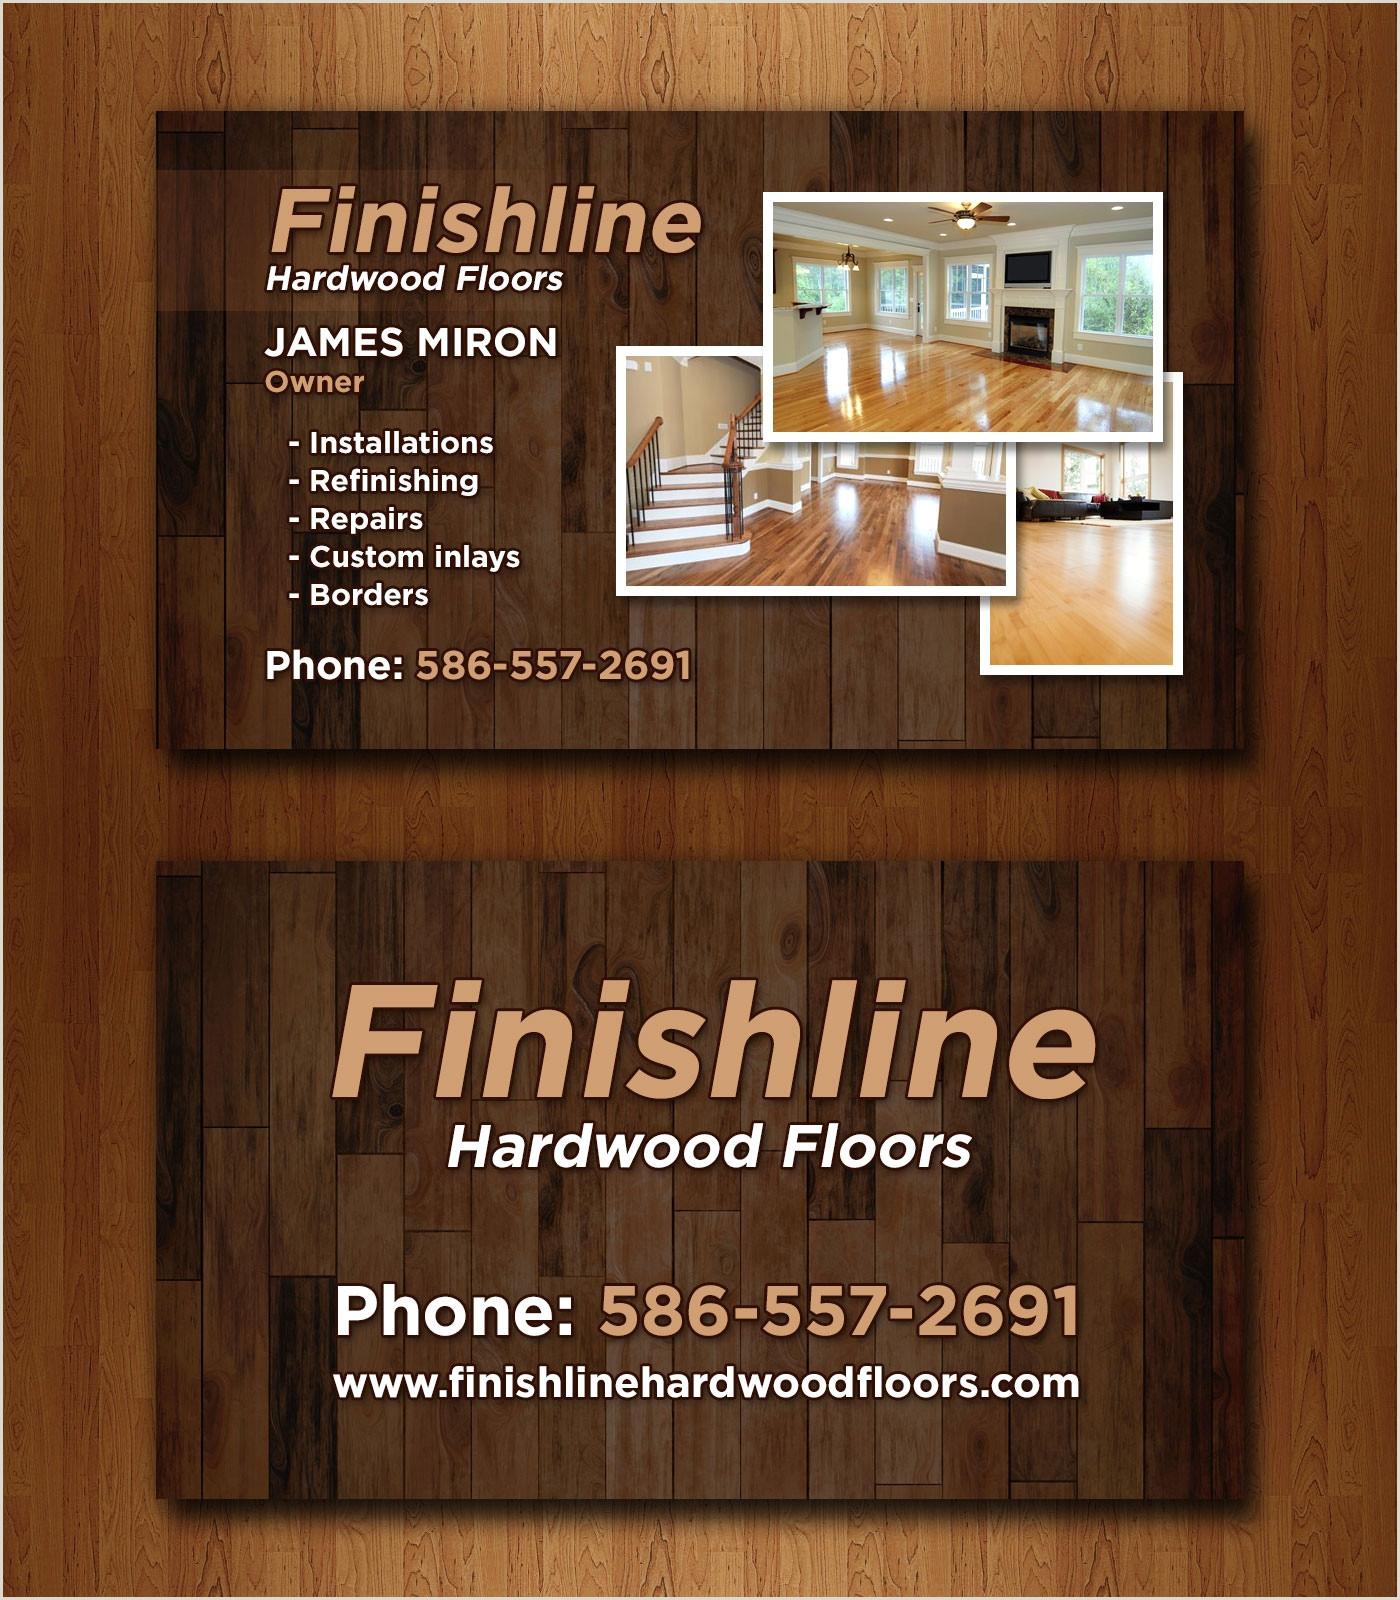 Creative Marketing Business Cards 14 Popular Hardwood Flooring Business Card Template